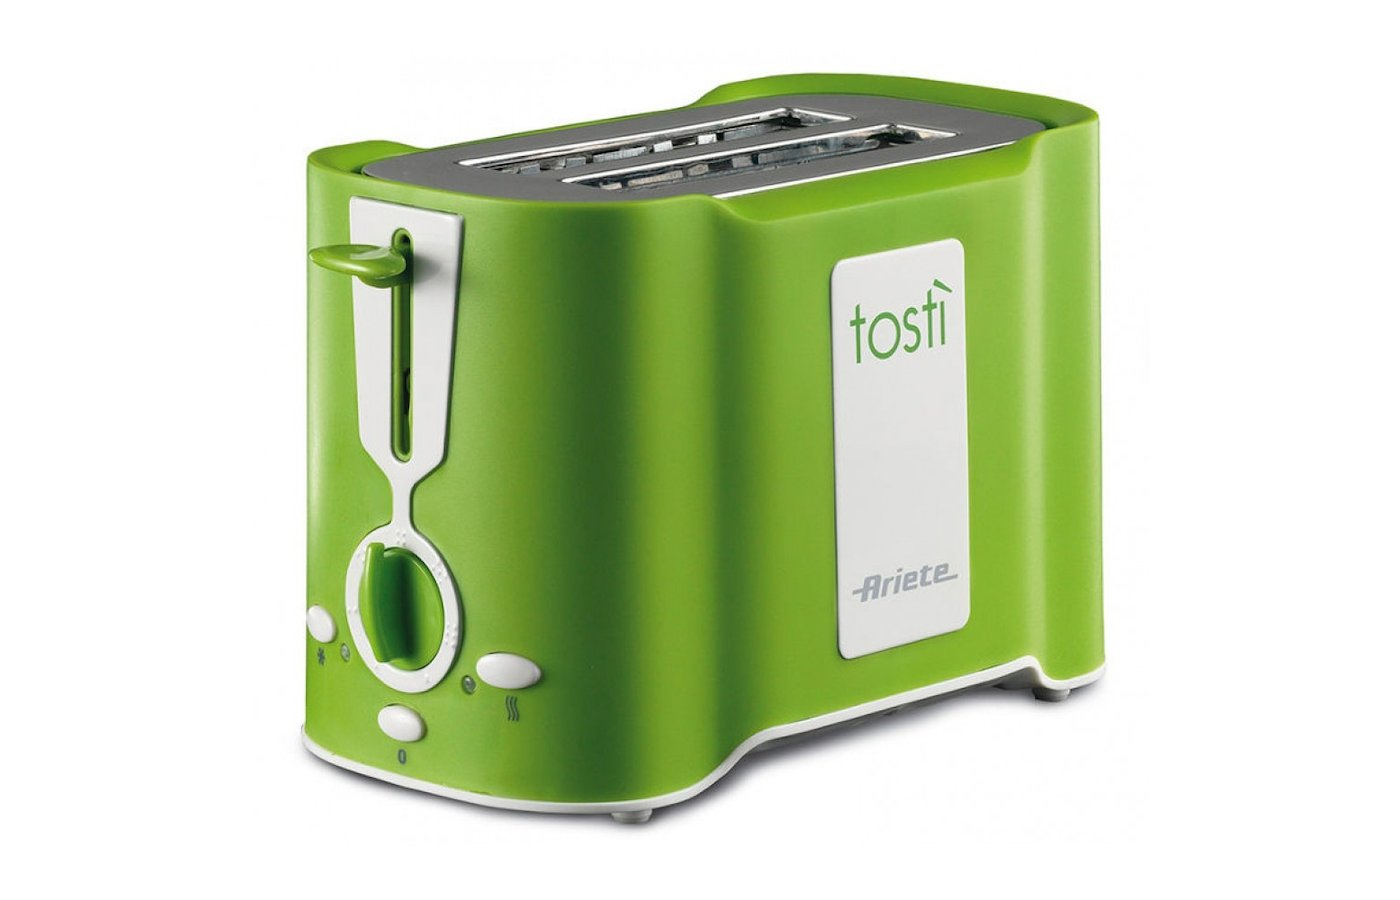 Тостер ARIETE 124/22 Toasty